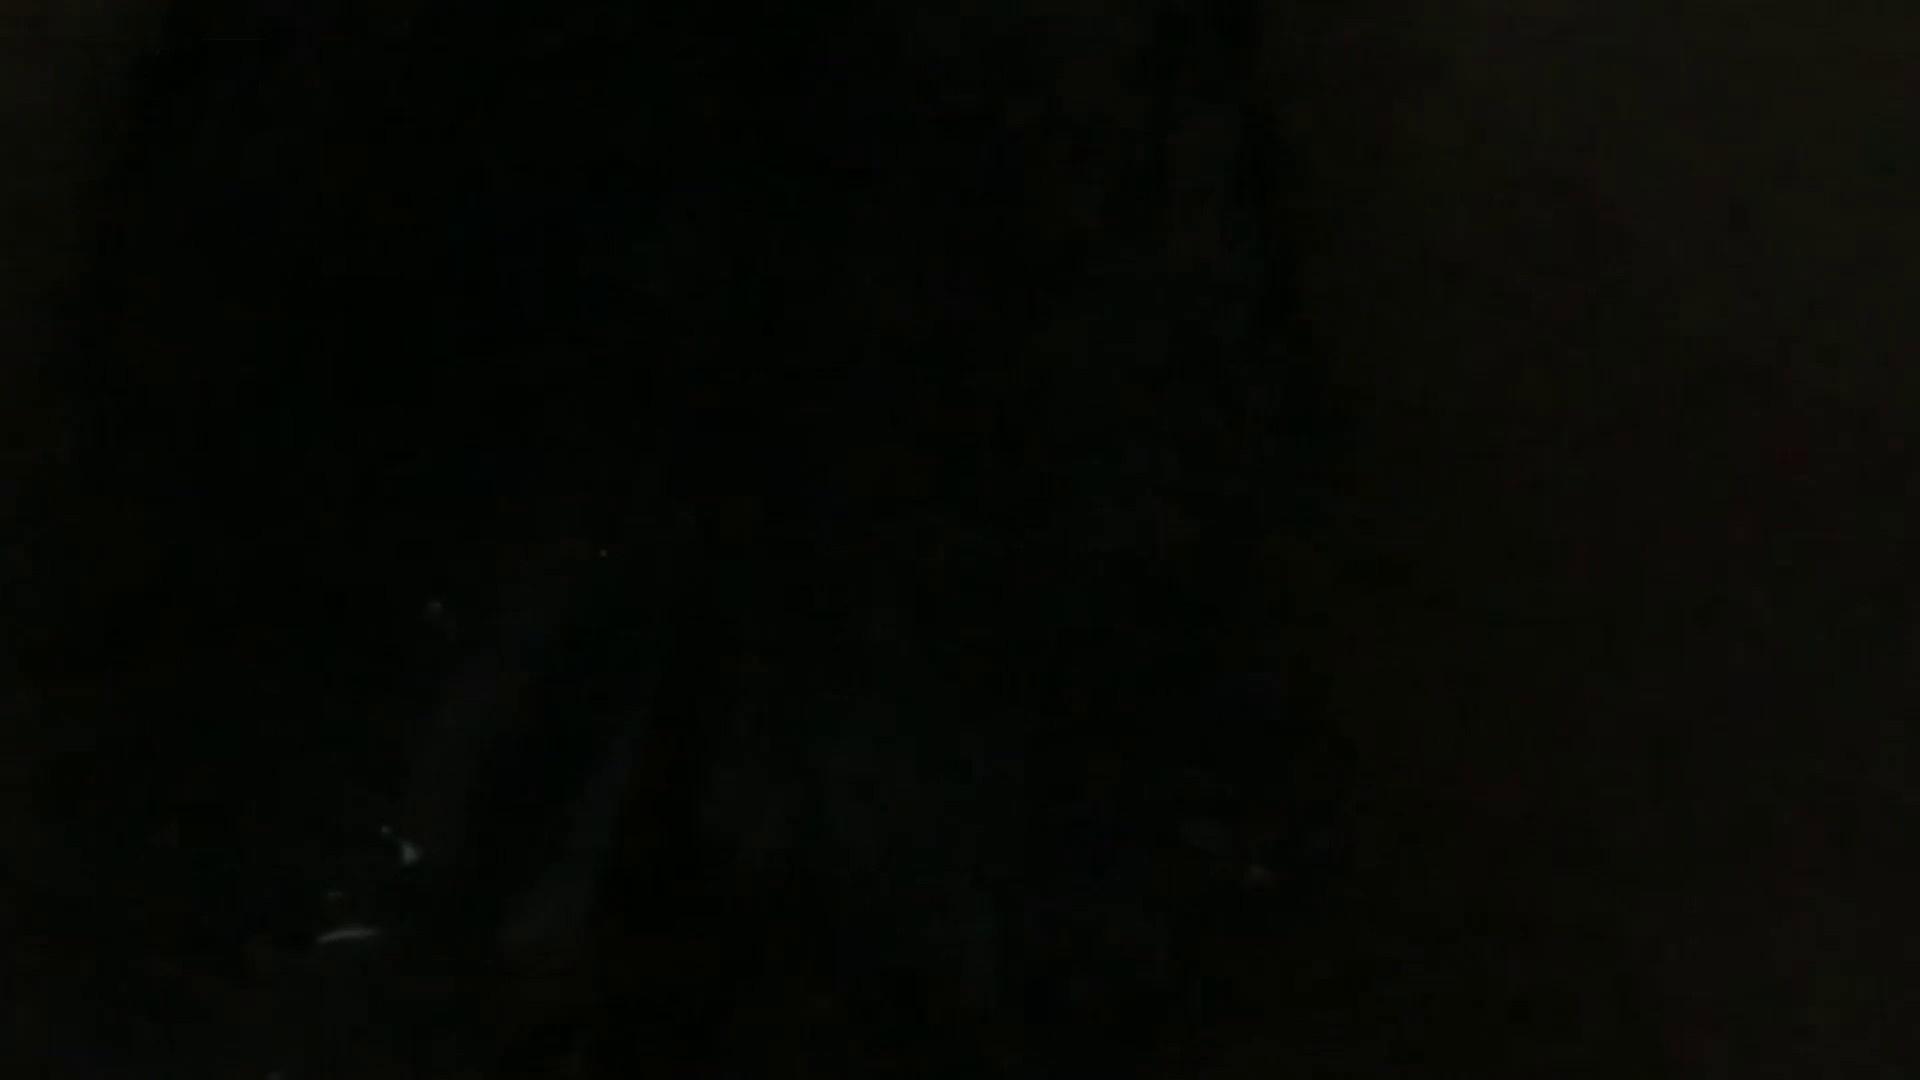 JD盗撮 美女の洗面所の秘密 Vol.30 丸見え 性交動画流出 100画像 3